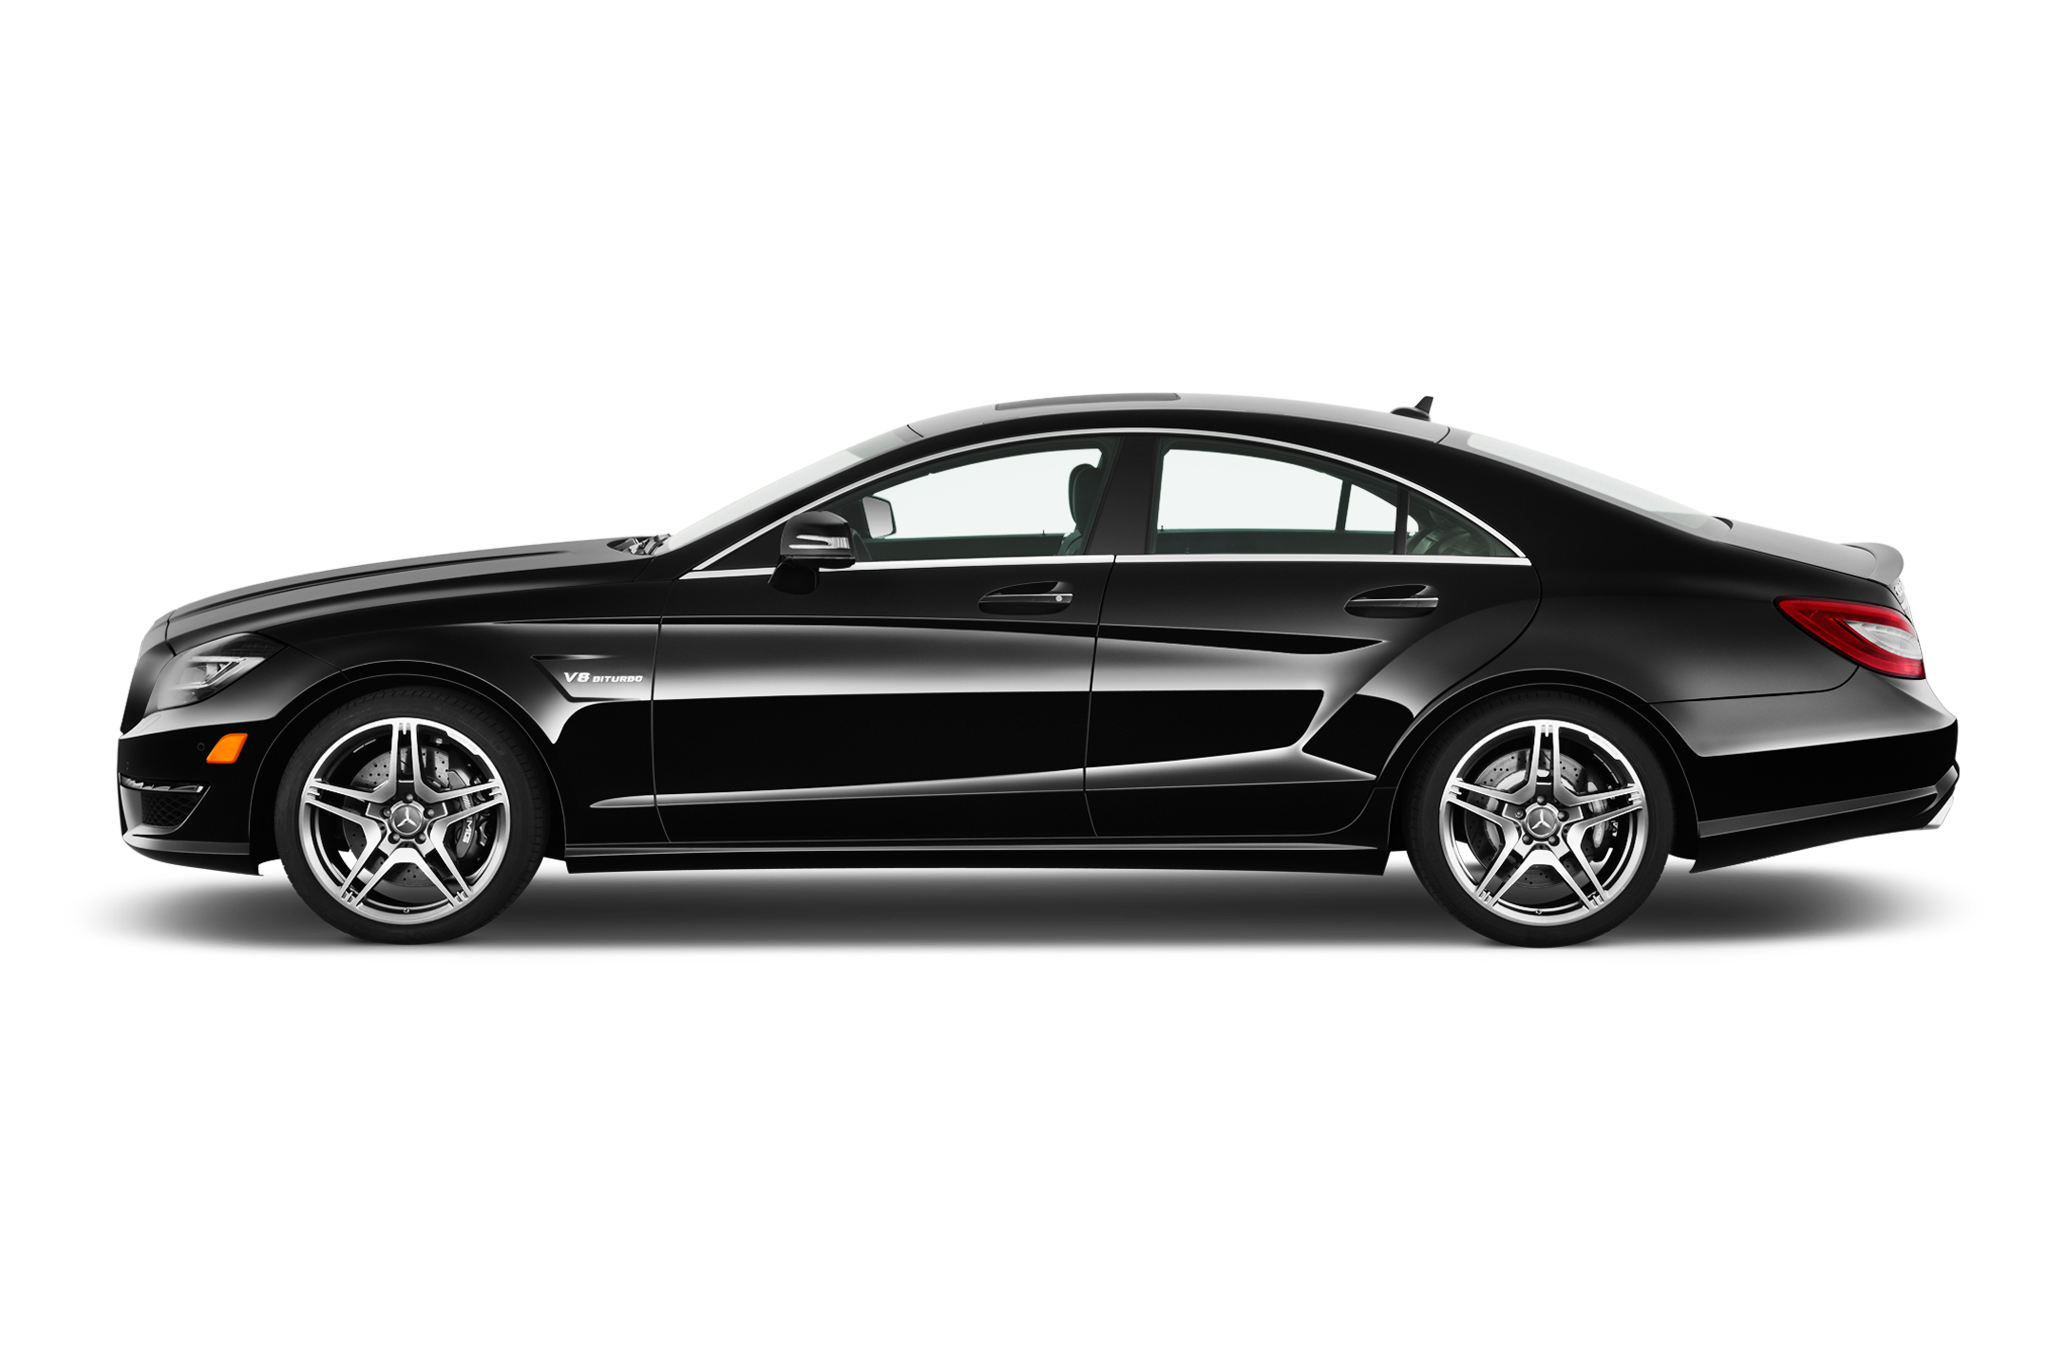 Mercedes-Benz CLS-klasse AMG II (W218) Restyling 2014 - now Station wagon 5 door #6